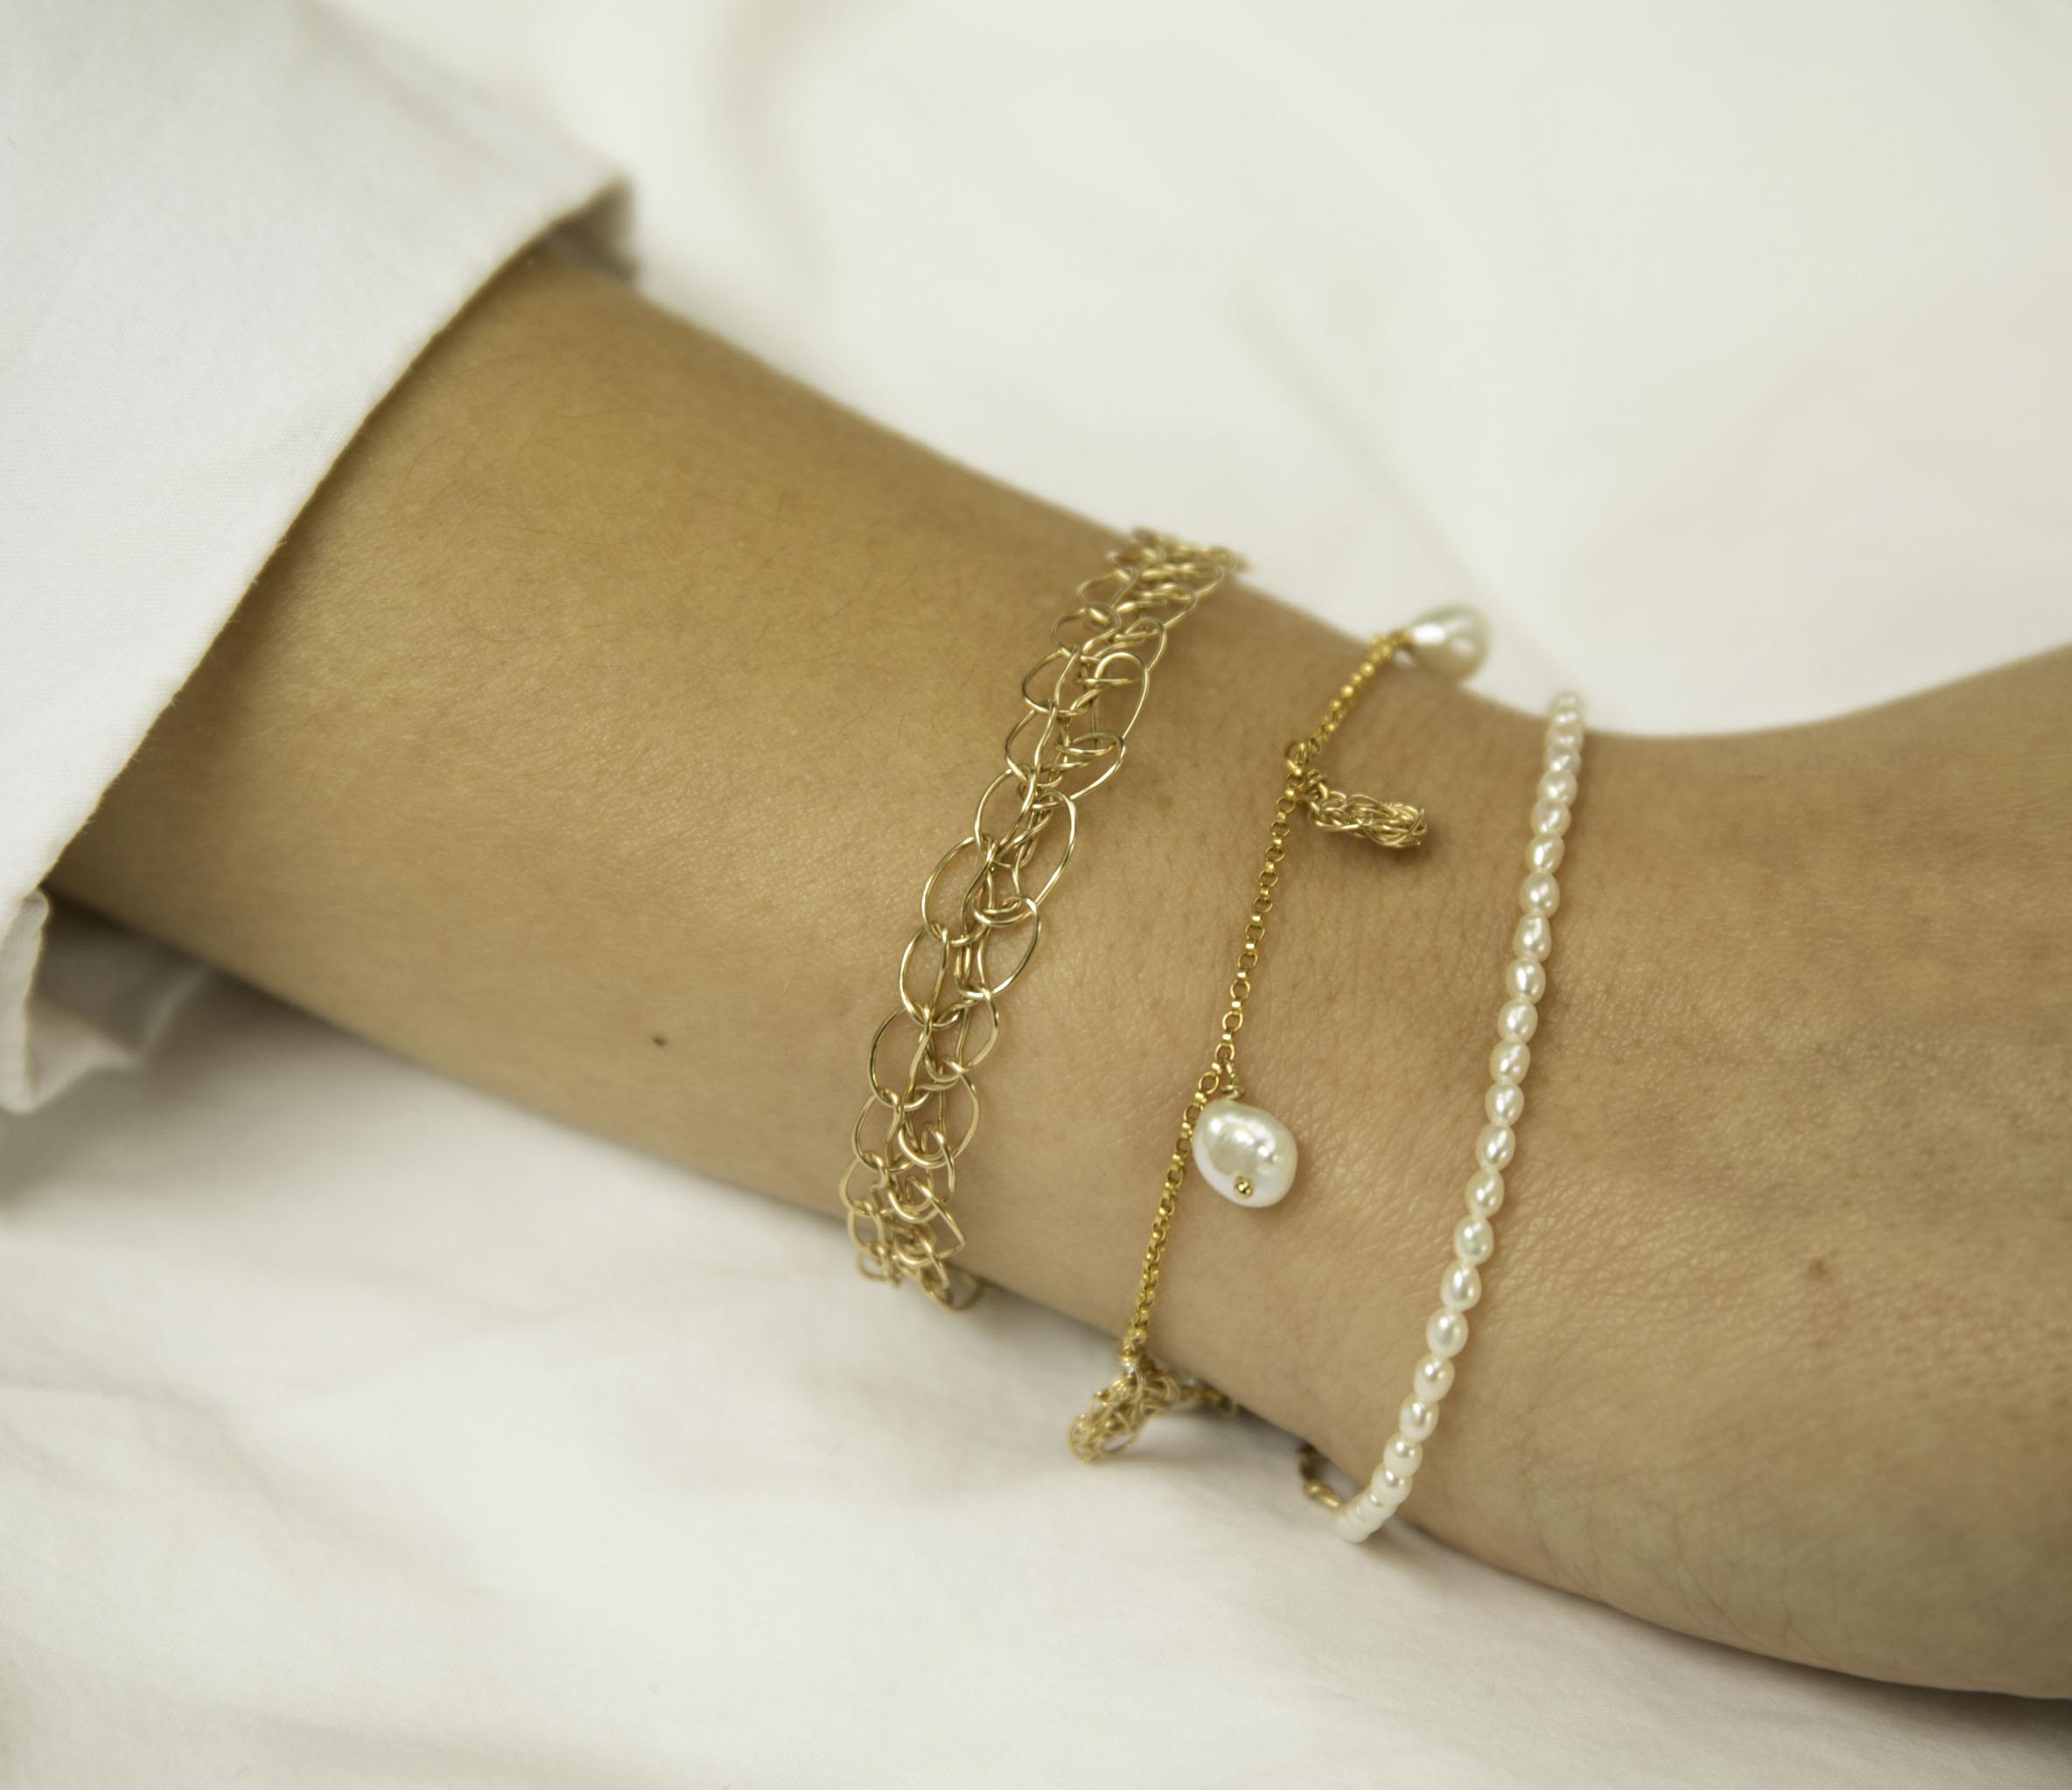 ALKYMI-ALl Bracelets.jpg